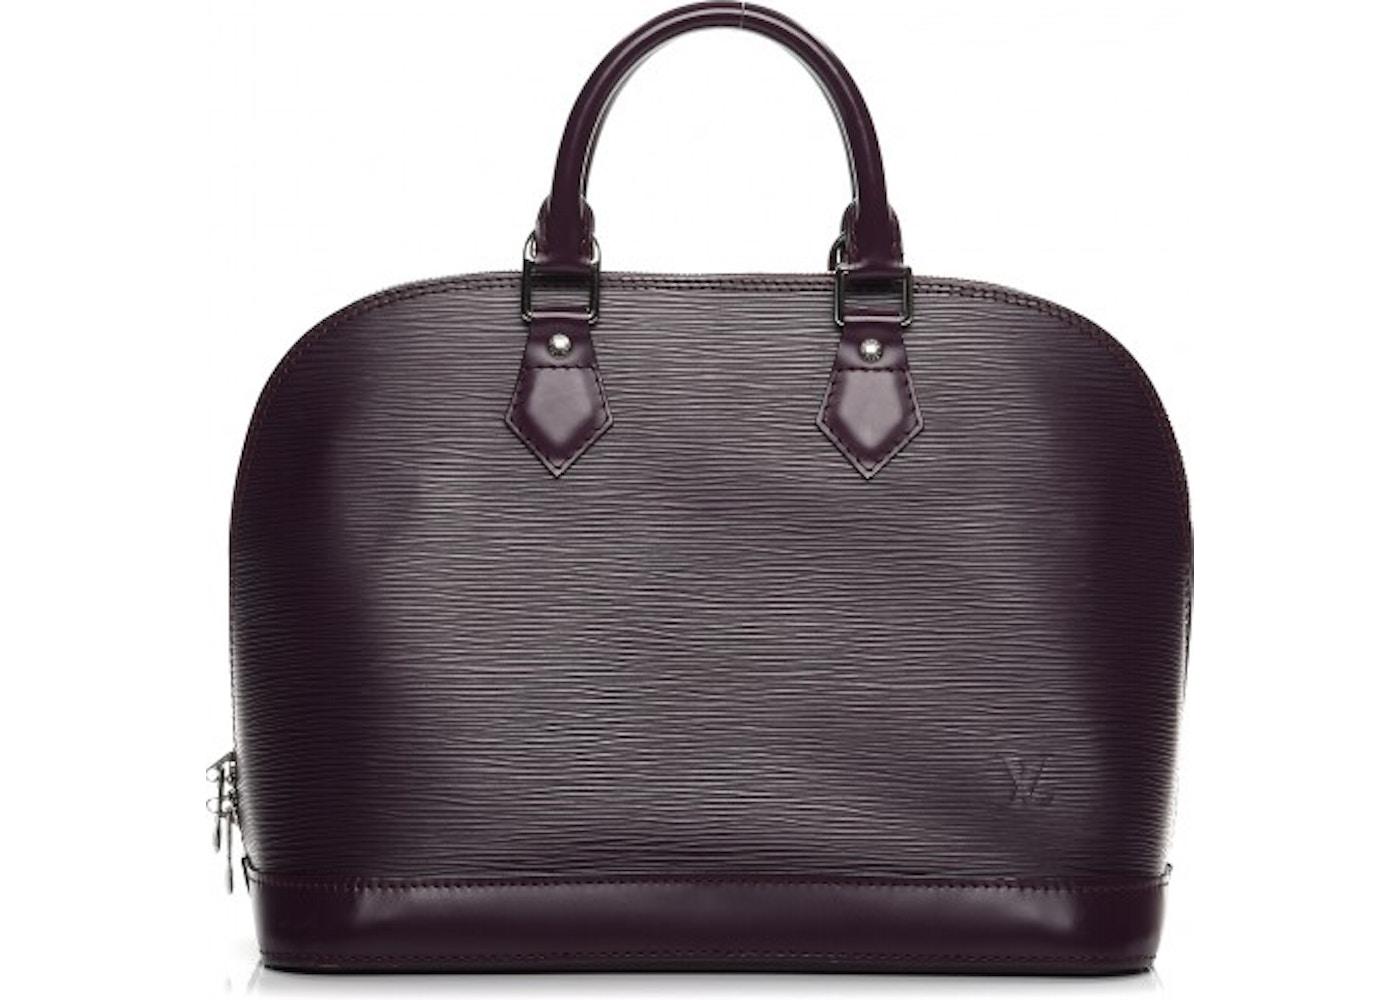 5ff5458bf9e1 Louis Vuitton Tote Alma Epi PM Cassis. Epi PM Cassis